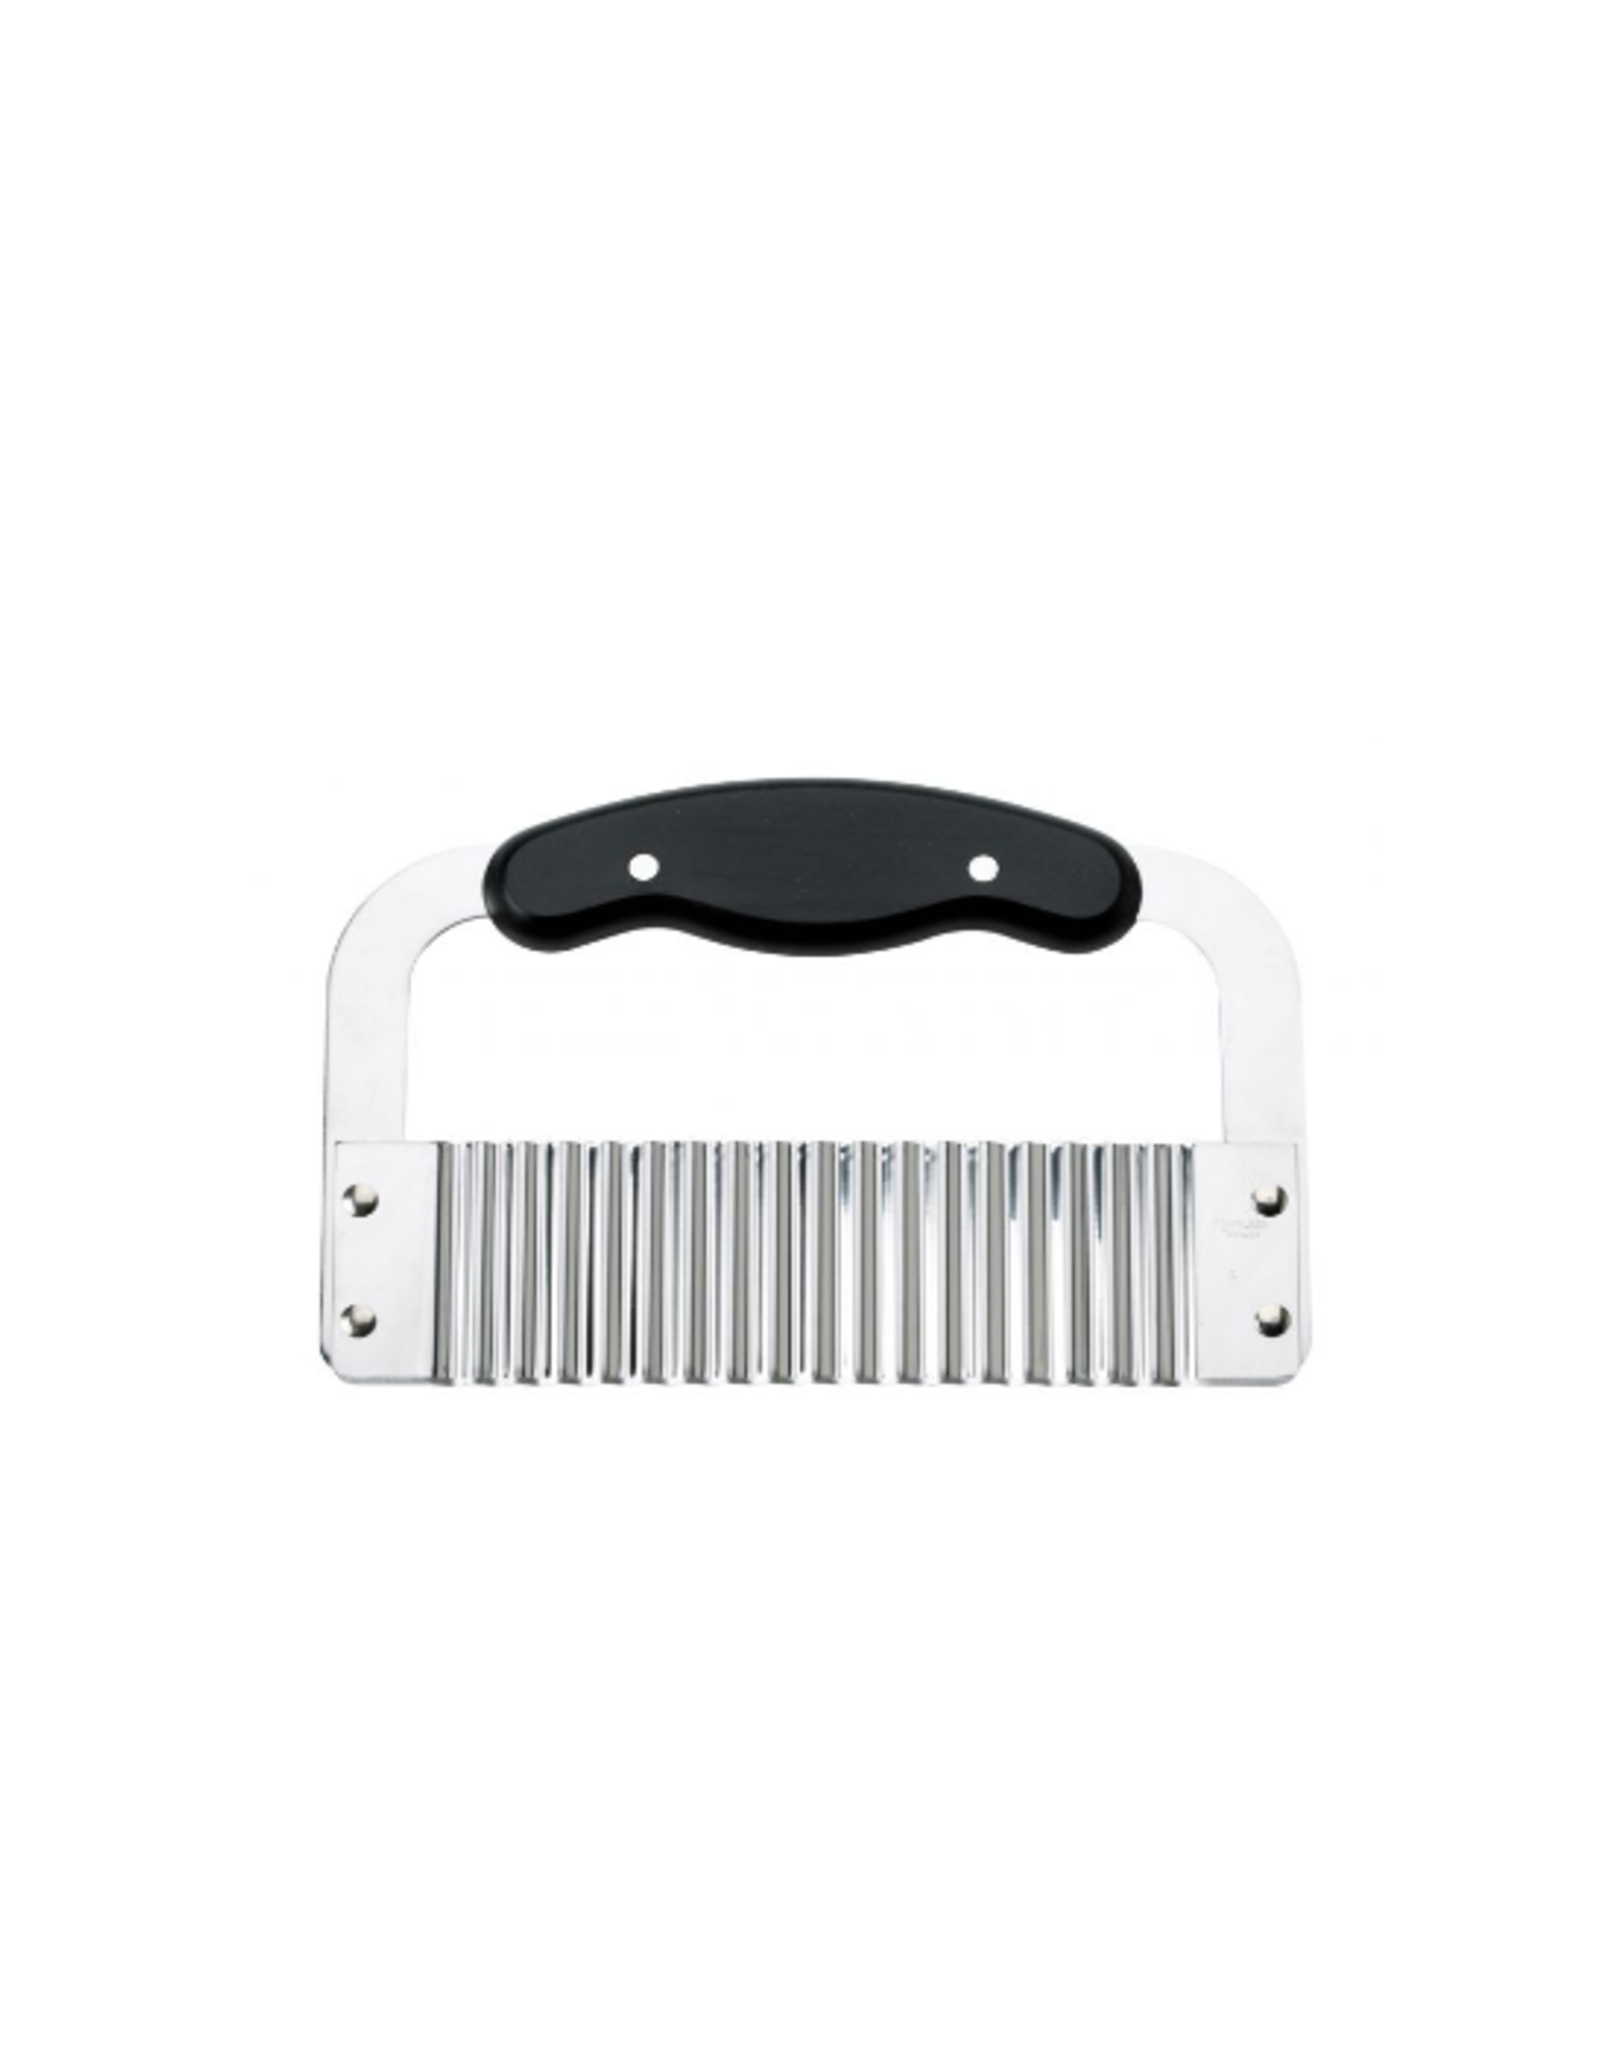 Harold Import Company Inc. Wave Slicer/Criss Cross Fries